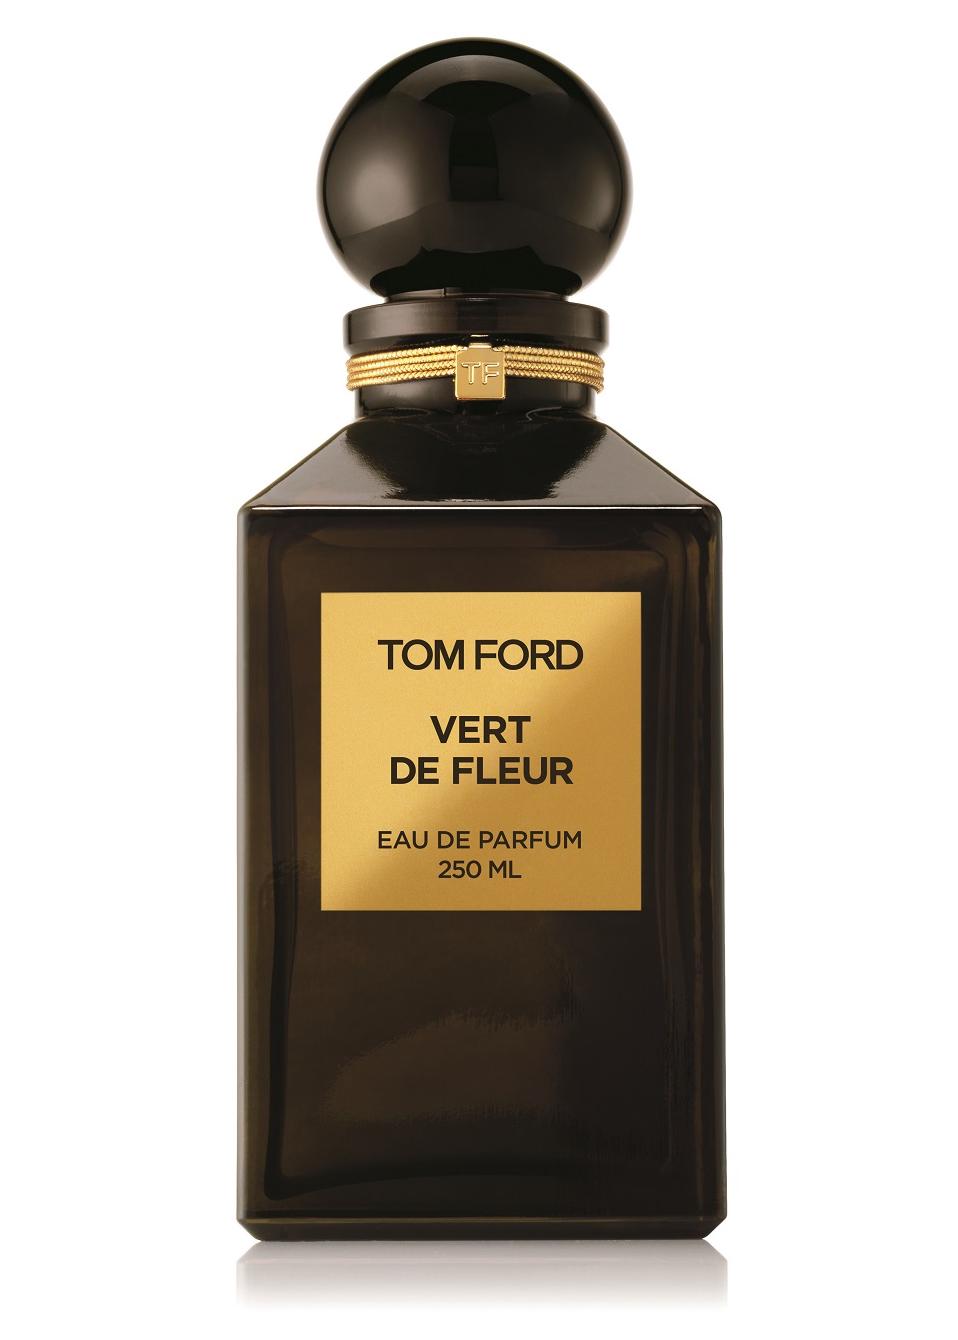 vert de fleur tom ford perfume a new fragrance for women and men 2016. Black Bedroom Furniture Sets. Home Design Ideas